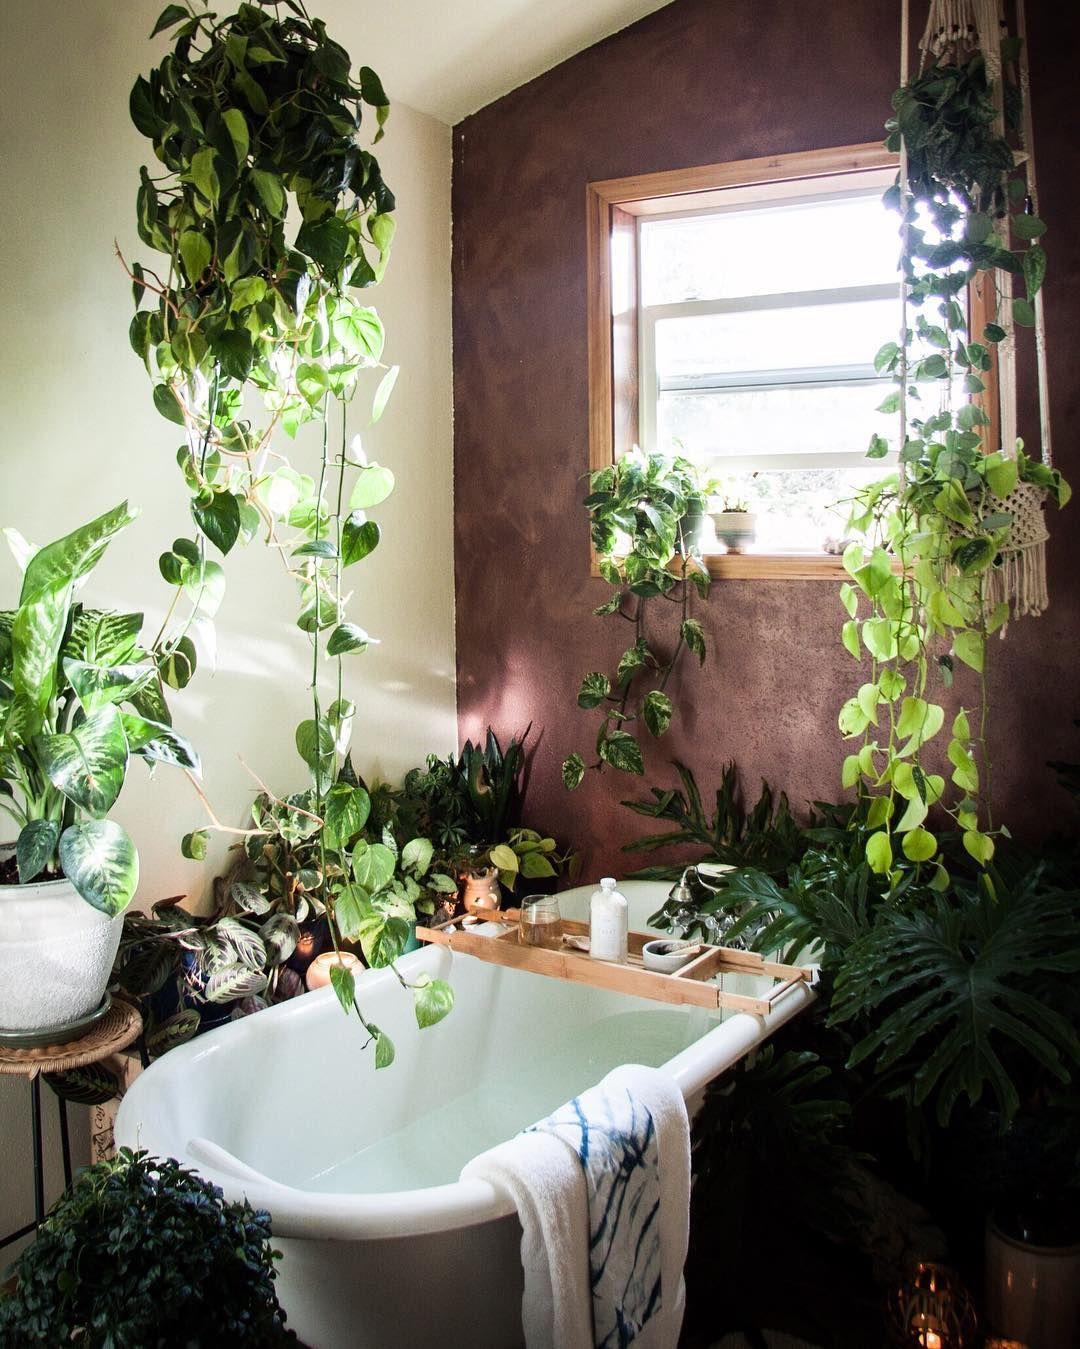 Garden tub decor   個讚 則留言  Instagram 上的 BEINGlivebybeing Up on